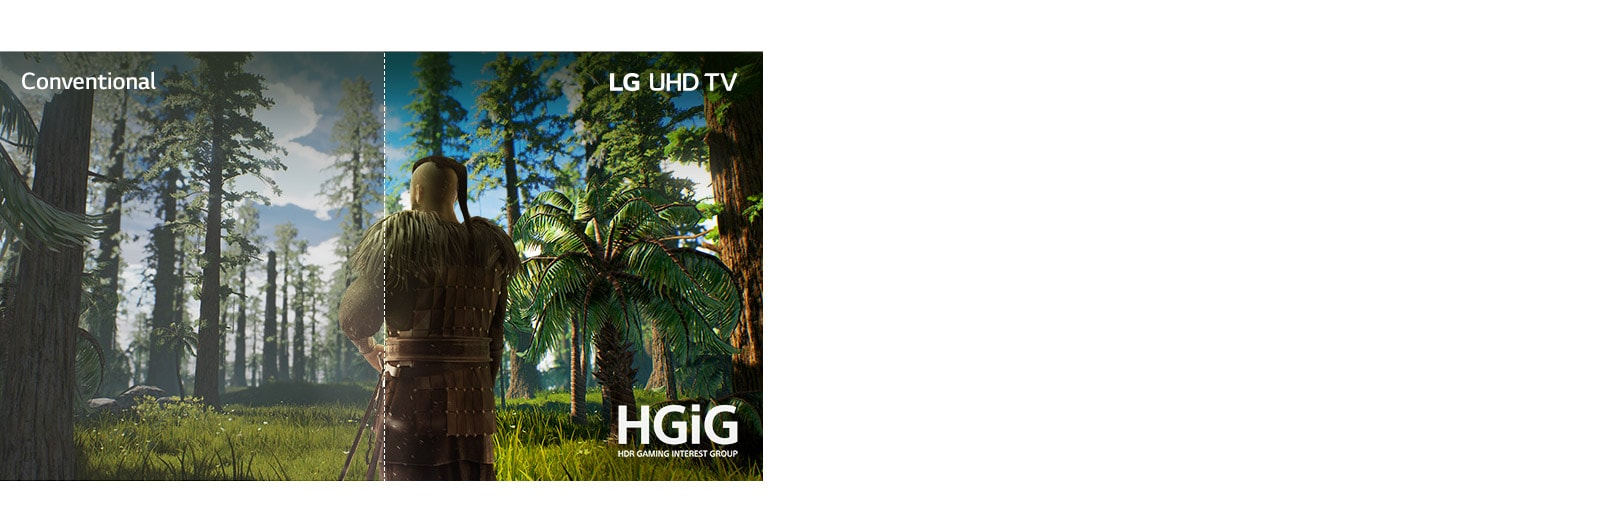 LG 70UN7300PTC HGiG profile